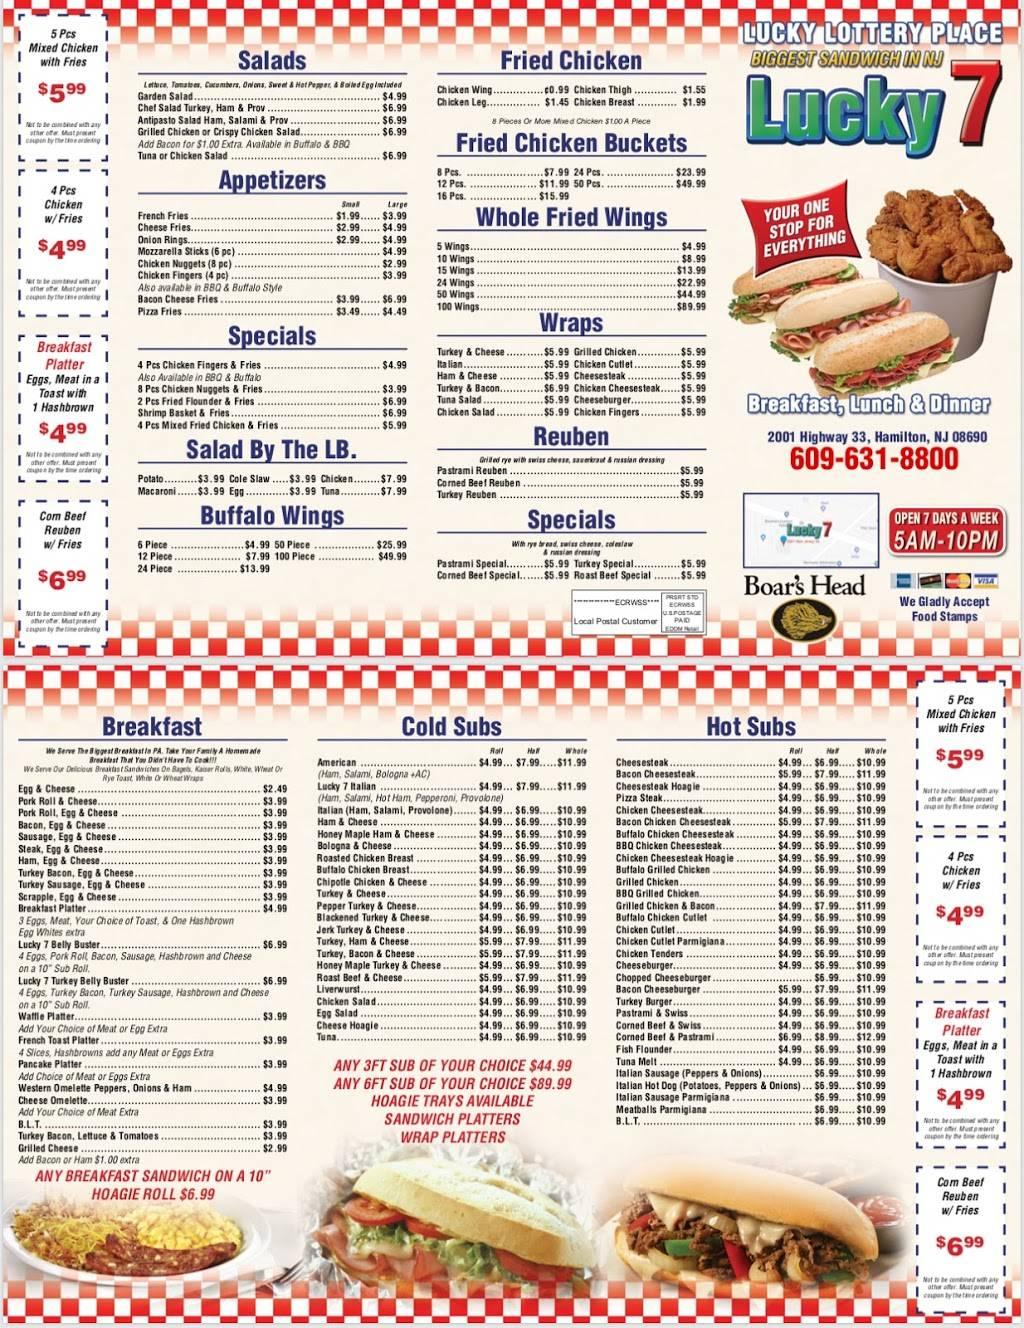 Lucky7 Deli Hamilton | restaurant | 2001 NJ-33, Trenton, NJ 08690, USA | 6096318800 OR +1 609-631-8800